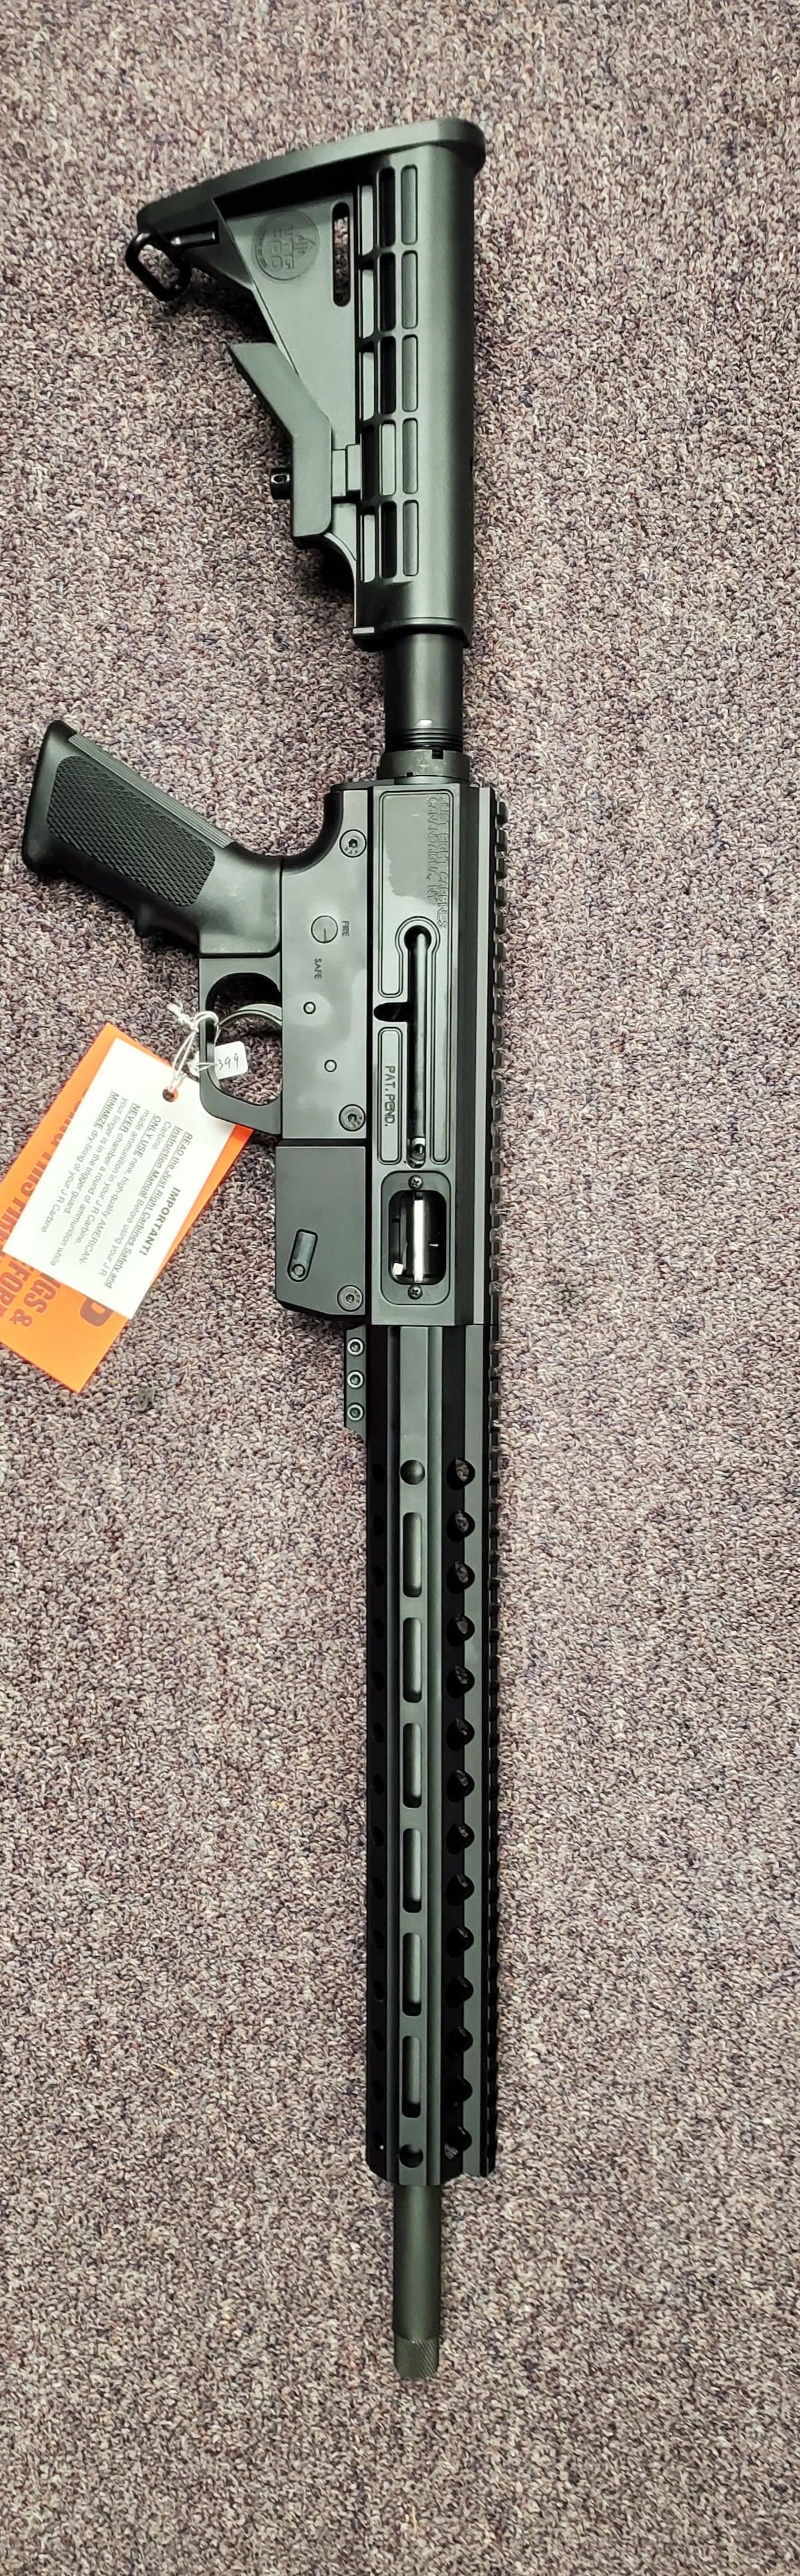 JUST RIGHT CARBINE Just Right Carbine Gen 3 9mm MLok Rail